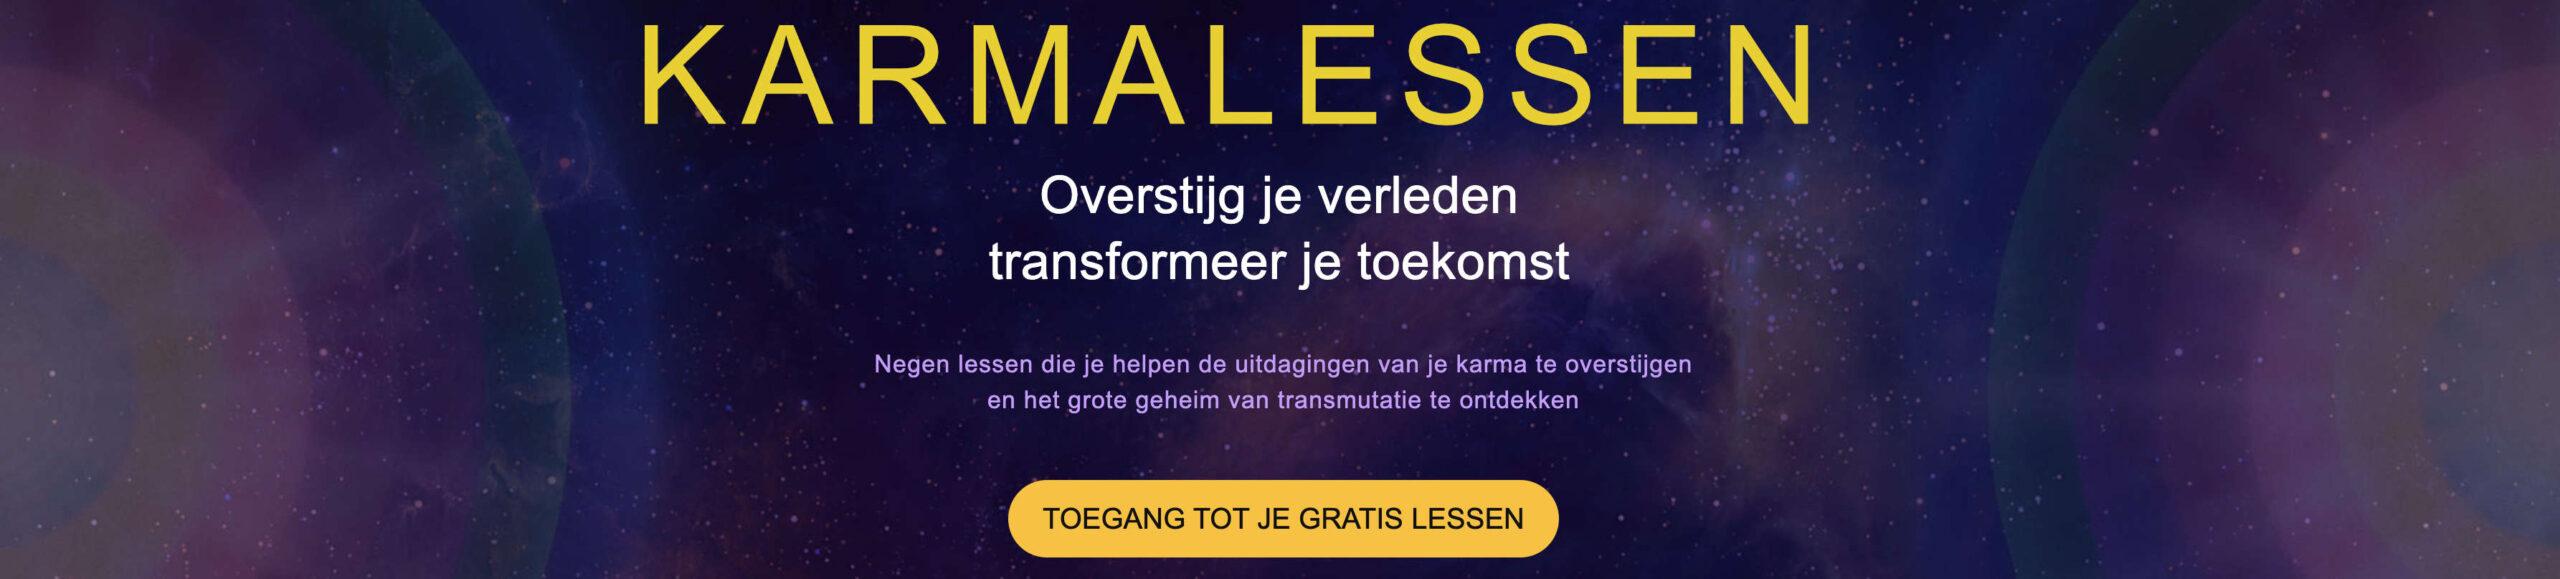 Karmalessen.nl